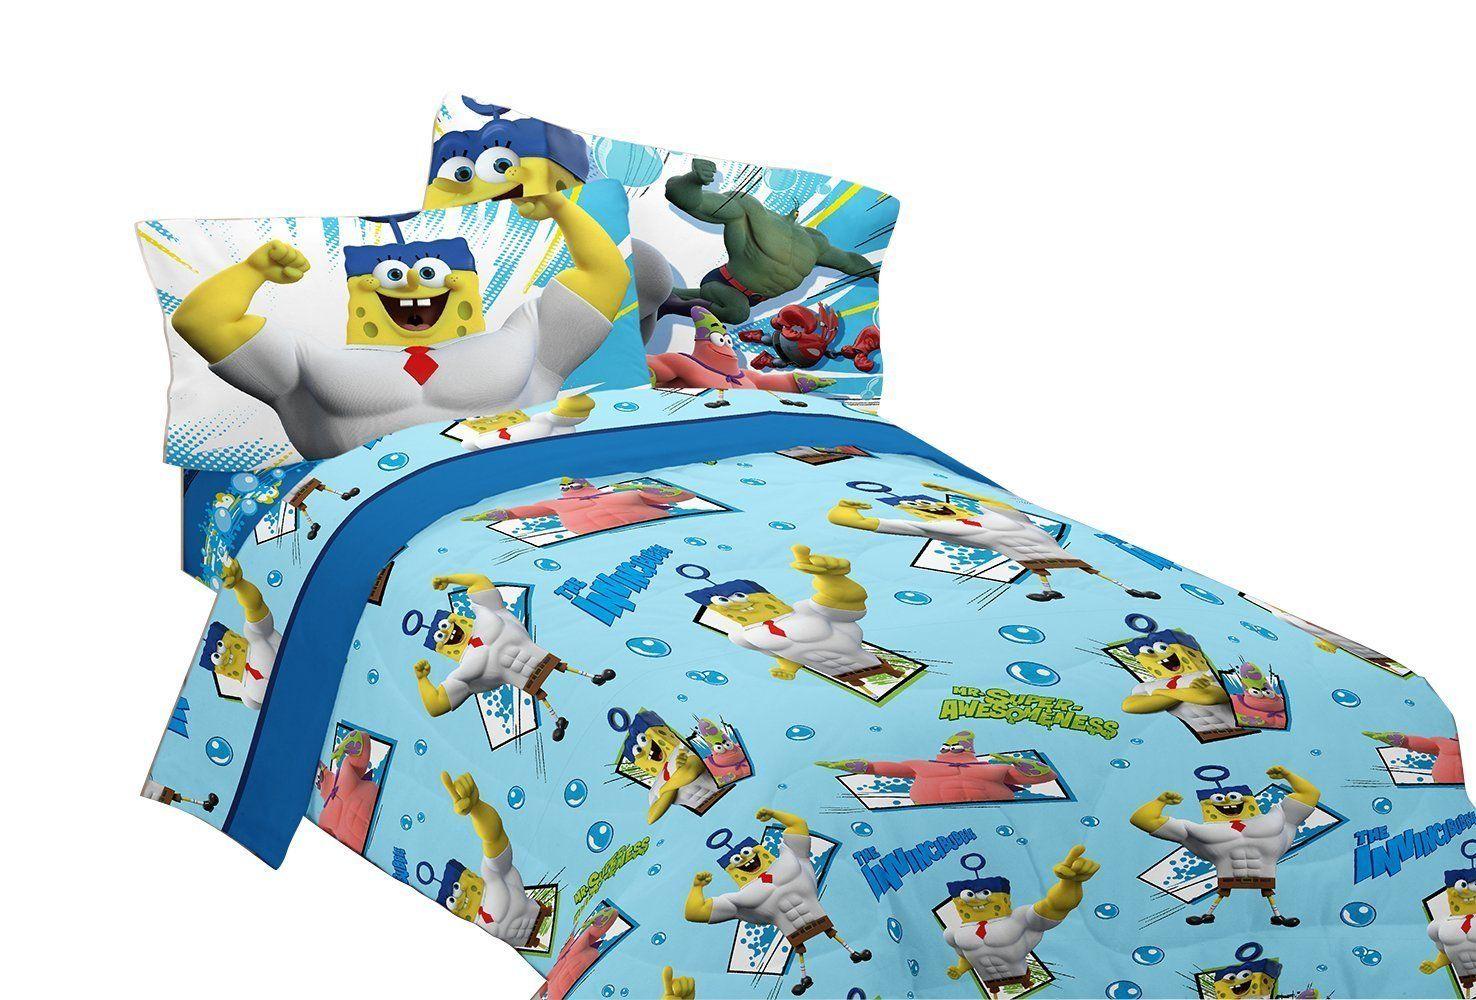 Spongebob Sponge Out of Water Sheet Set (Twin) (With